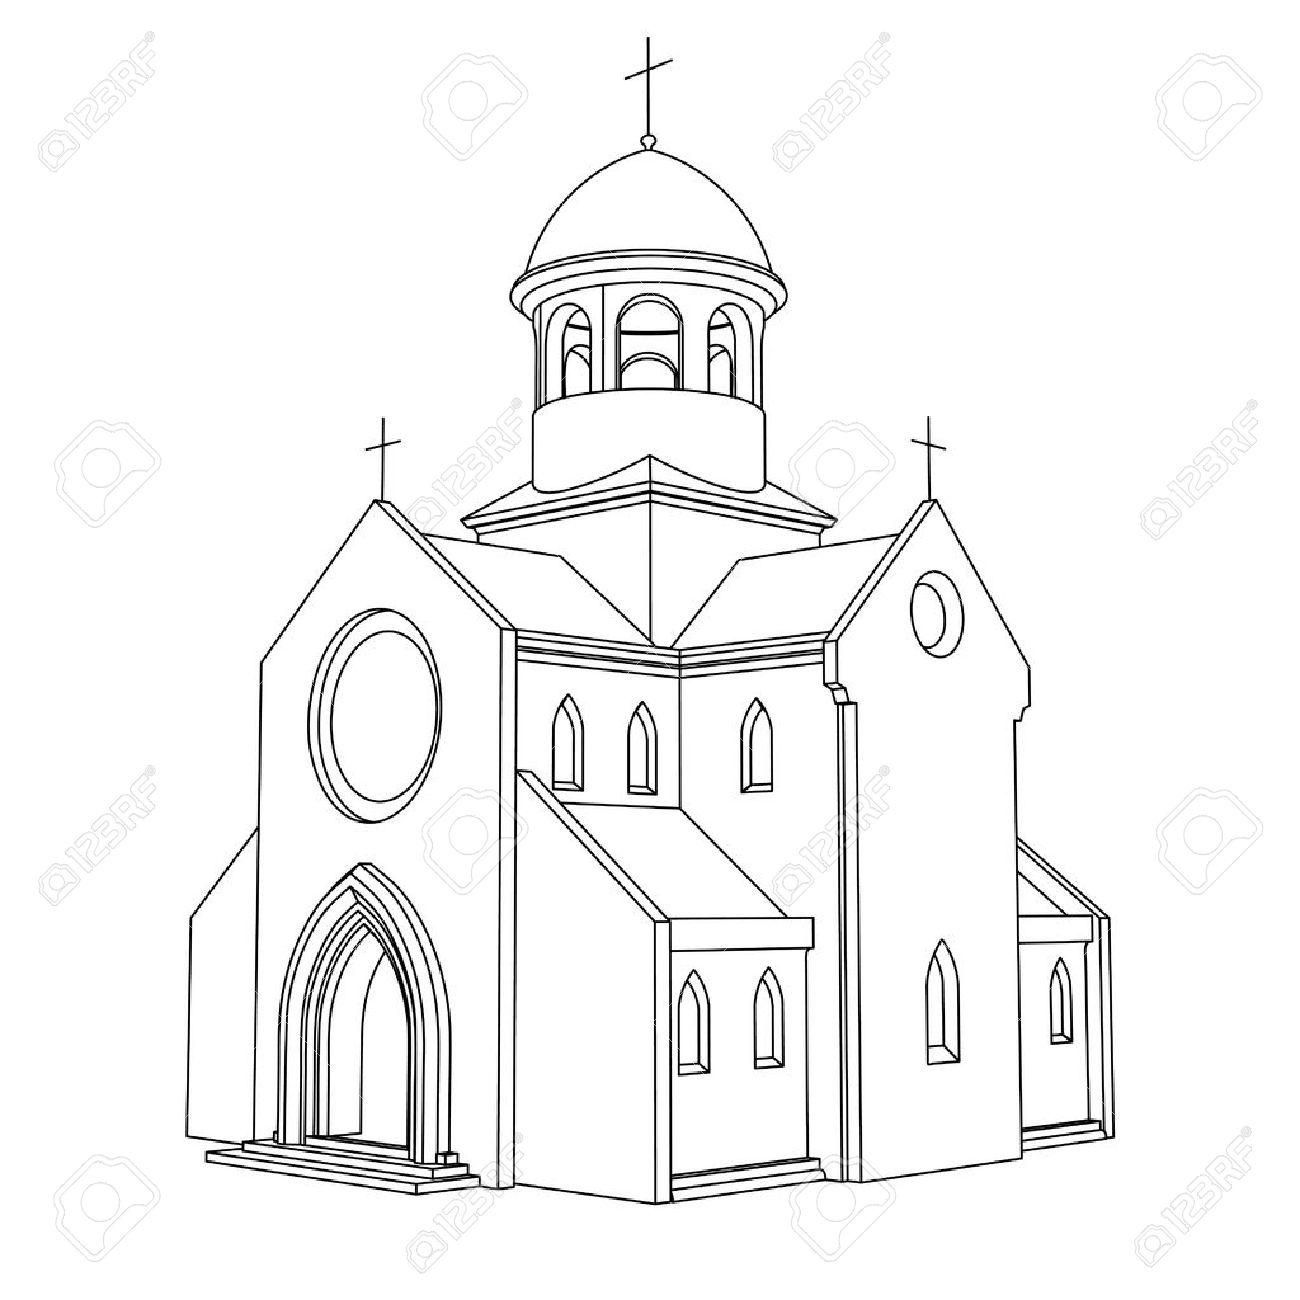 1300x1300 Line Art Ancient Basilica Drawing Vector Illustration Royalty Free